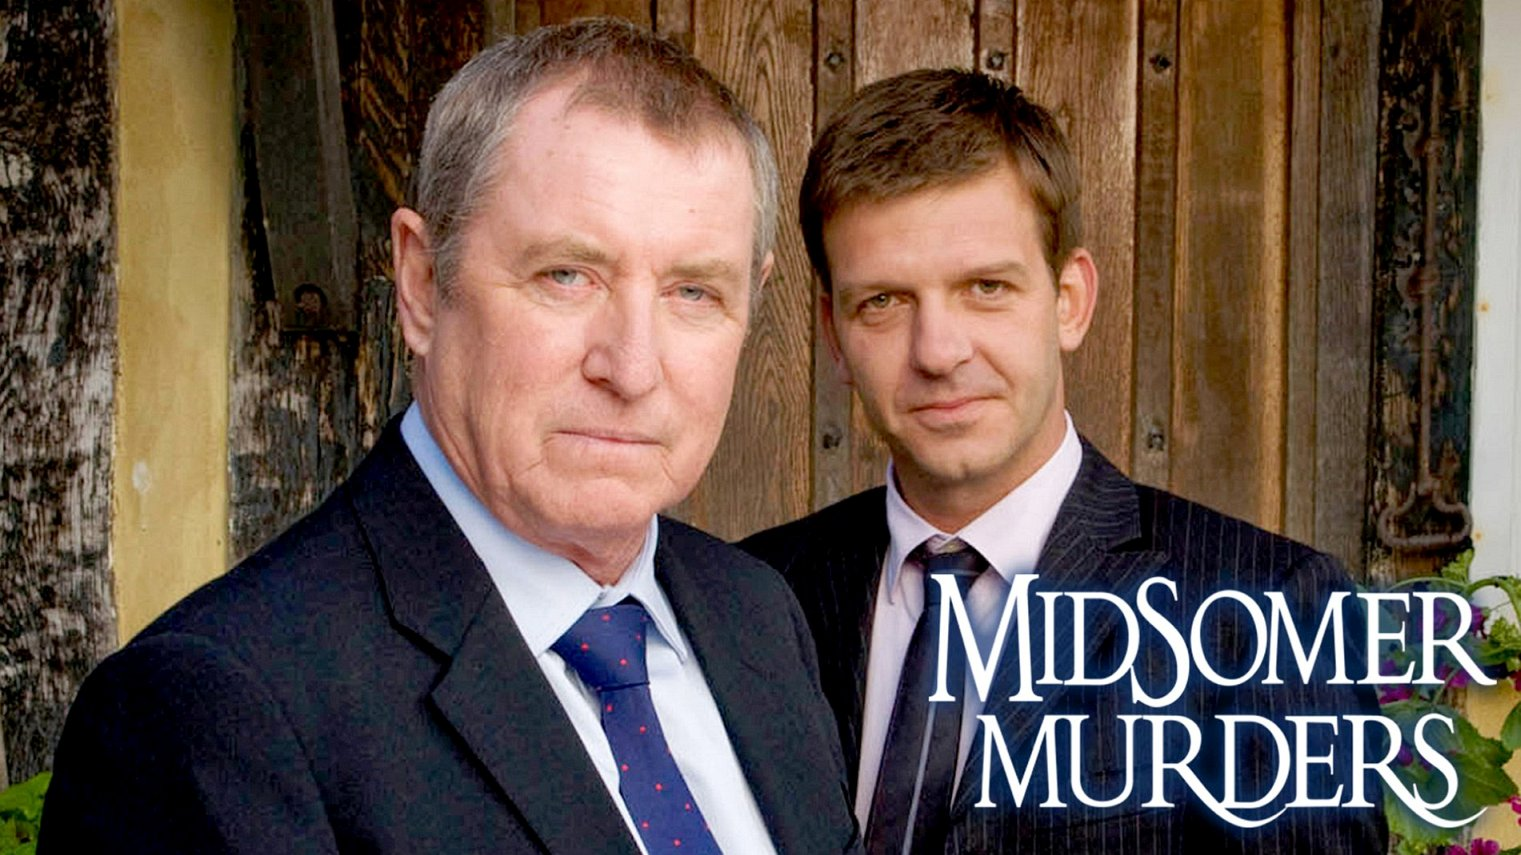 cast of Midsomer Murders season 19